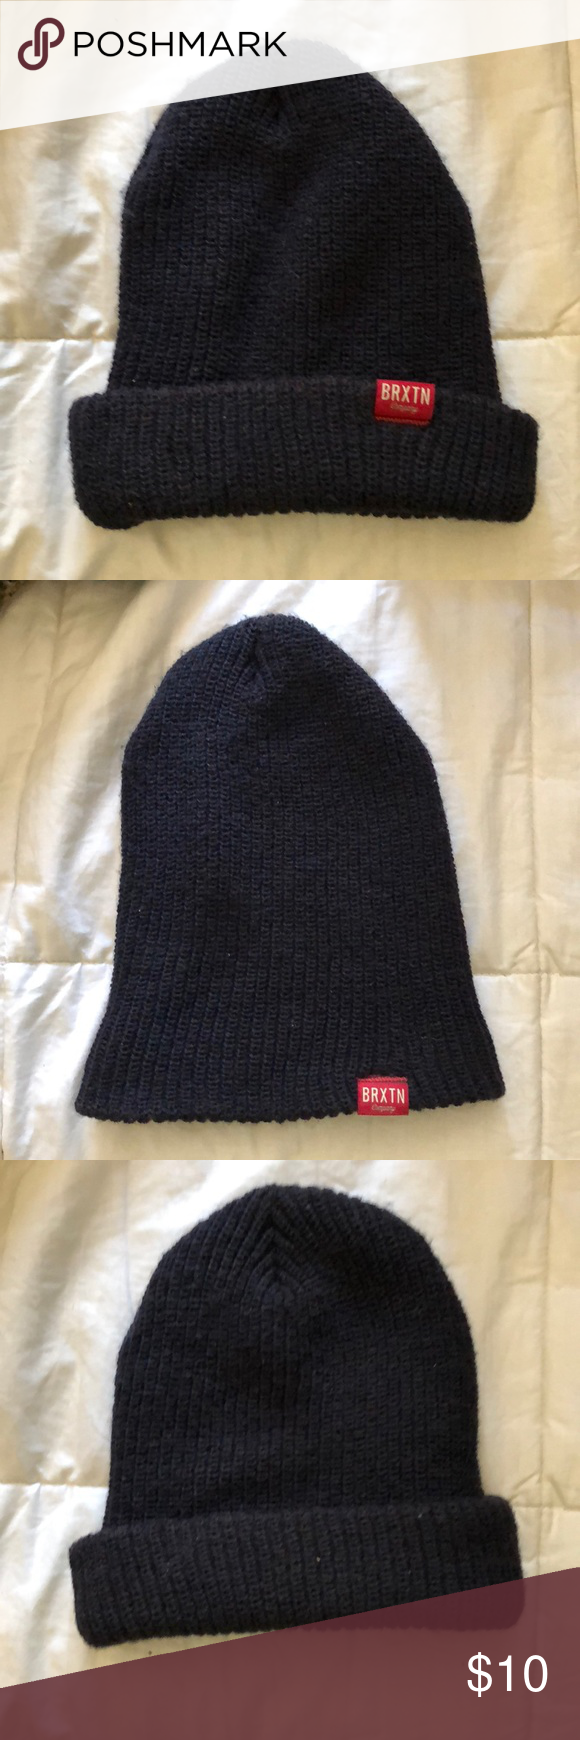 970f8e2a6 Brixton Redmond Beanie Dark blue/indigo color. Knit. Only worn twice ...